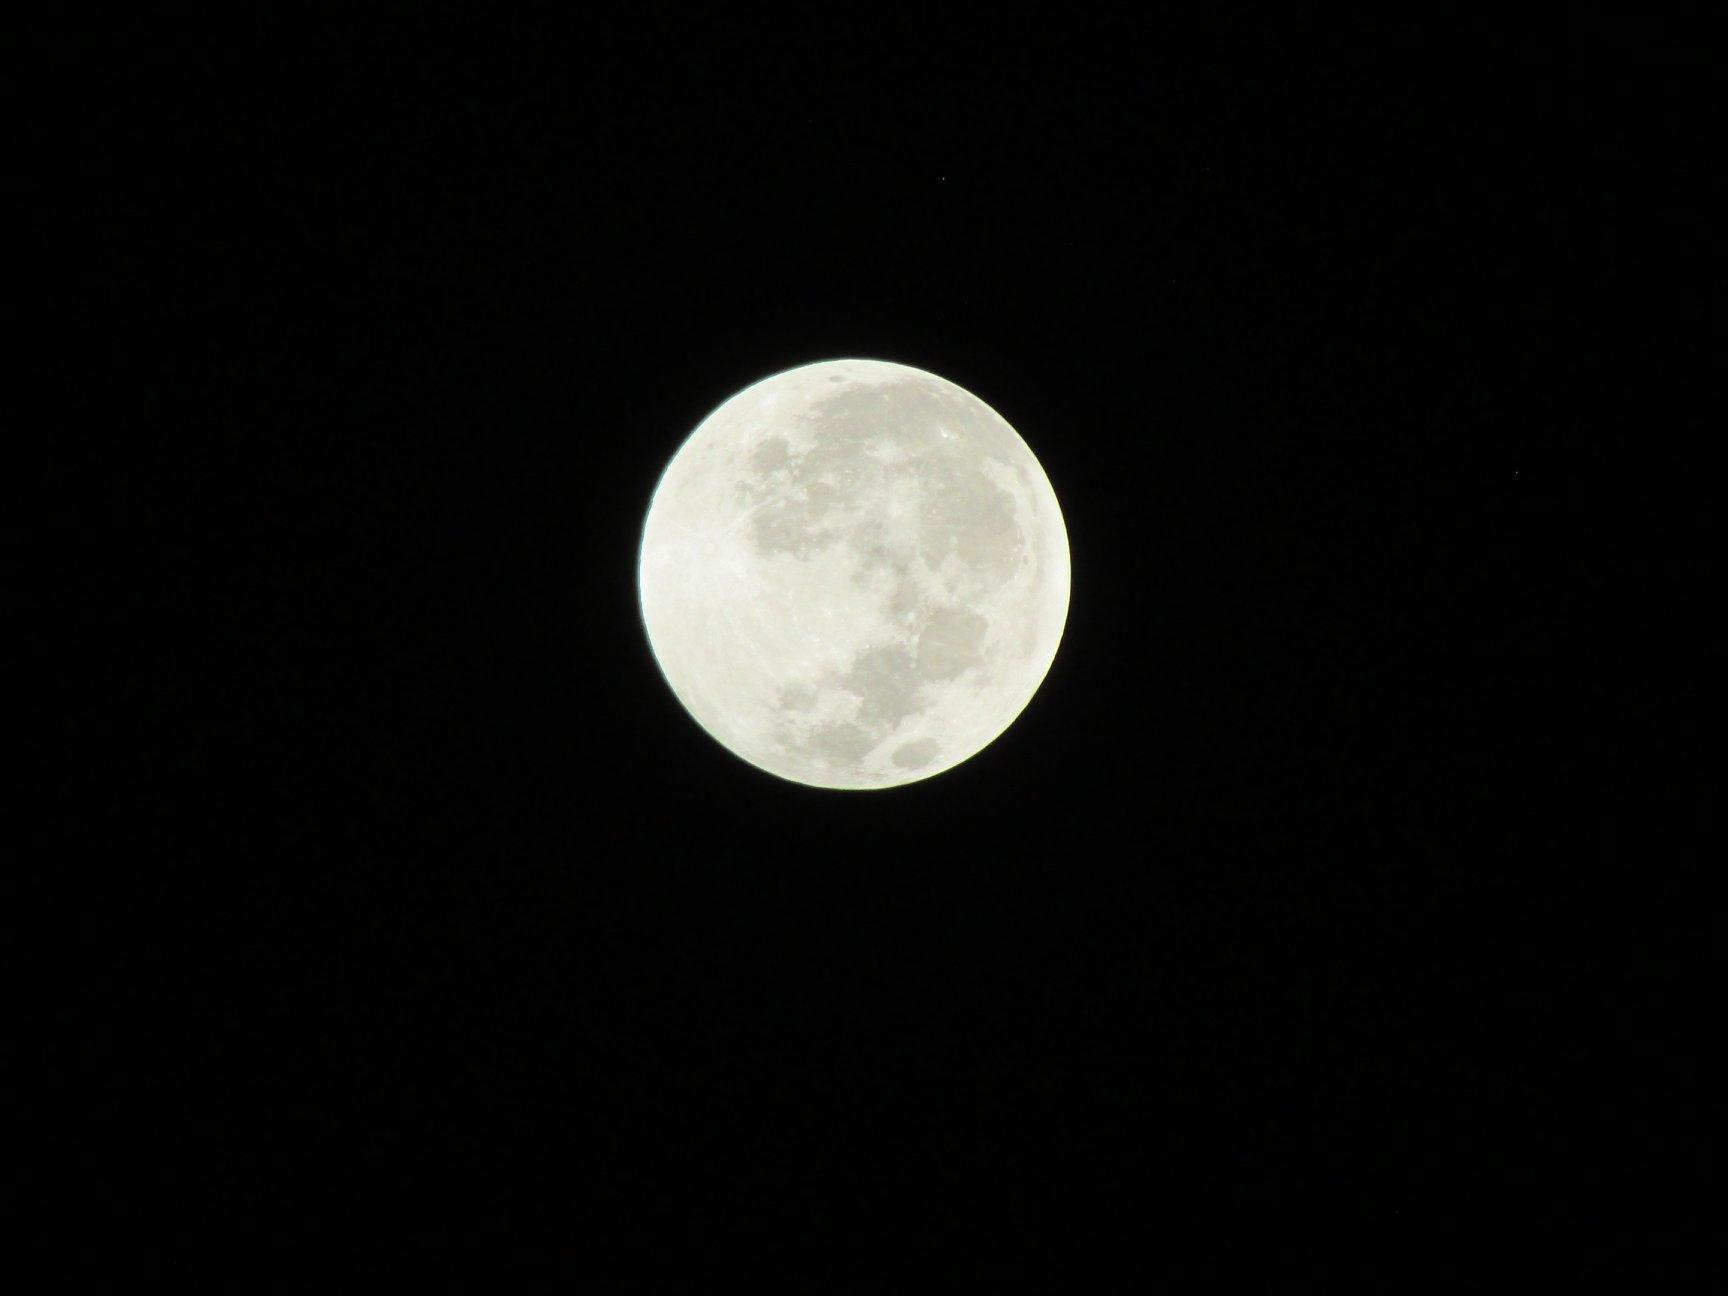 Total Lunar Eclipse, Blood Moon and Supermoon from Maturín, Venezuela / Prof. Juan F. Peraza Marsiglia